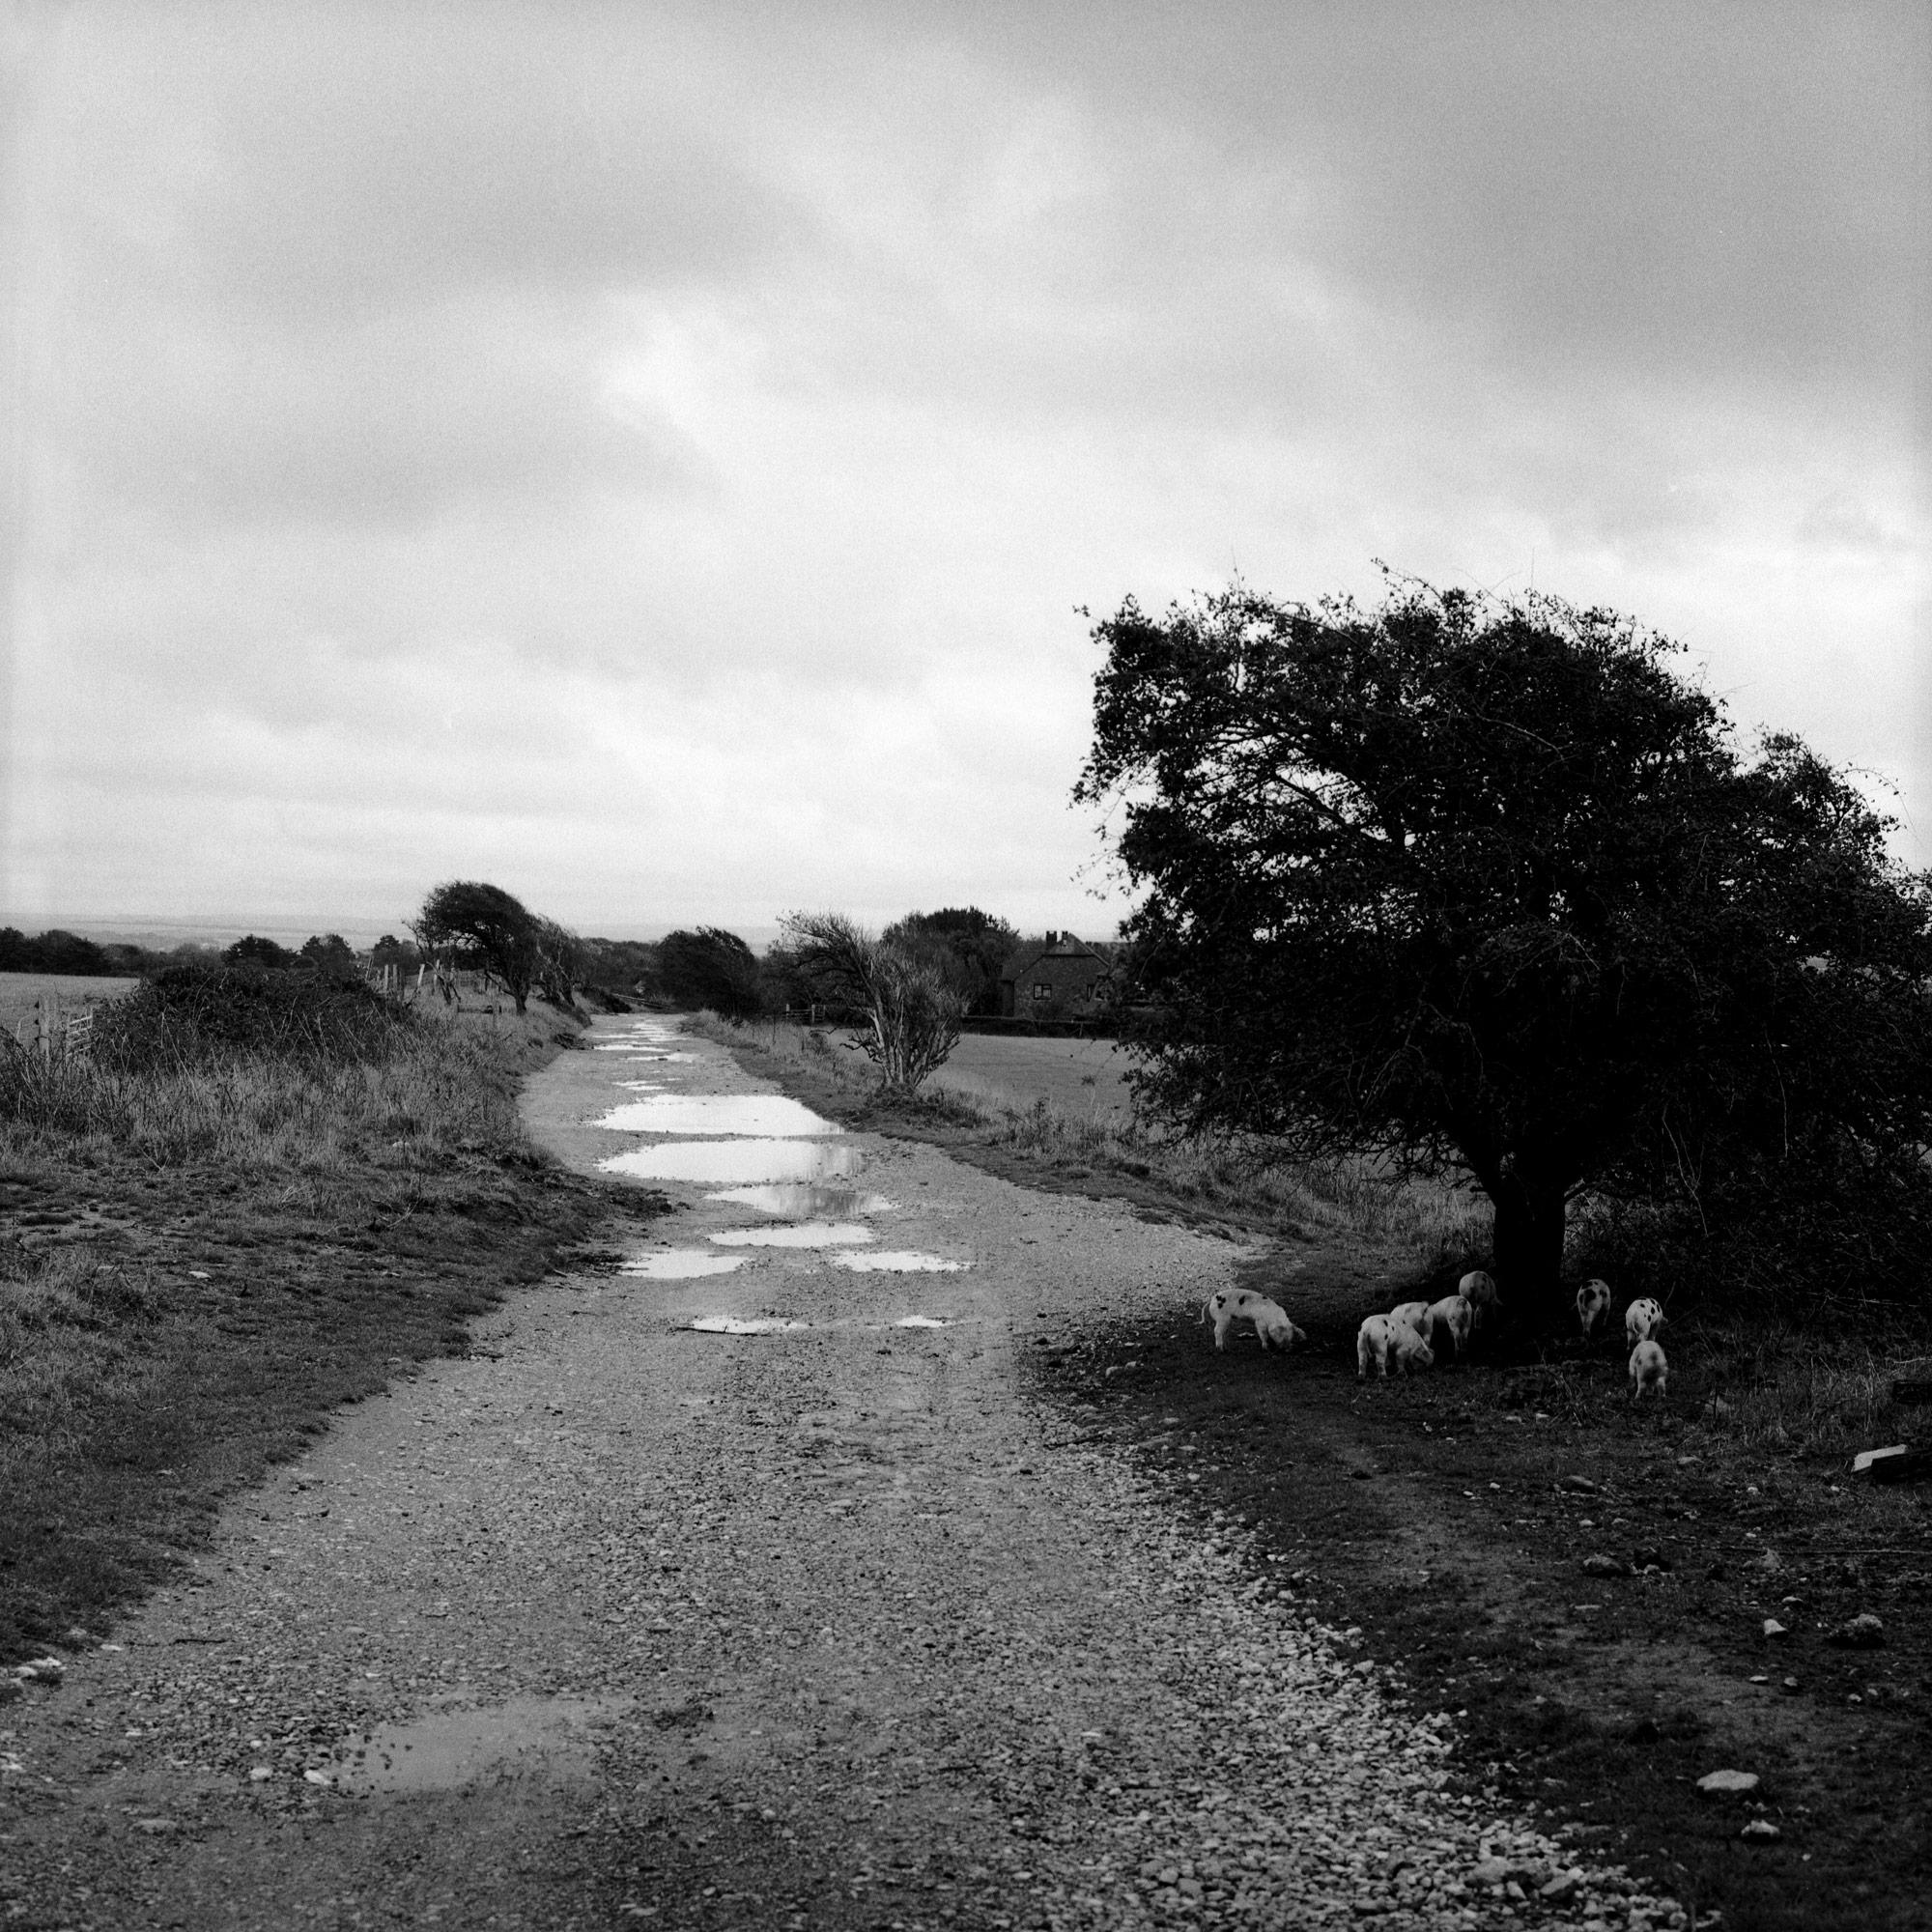 Piglets under the tree, landscape on film by ioannis koussertari.